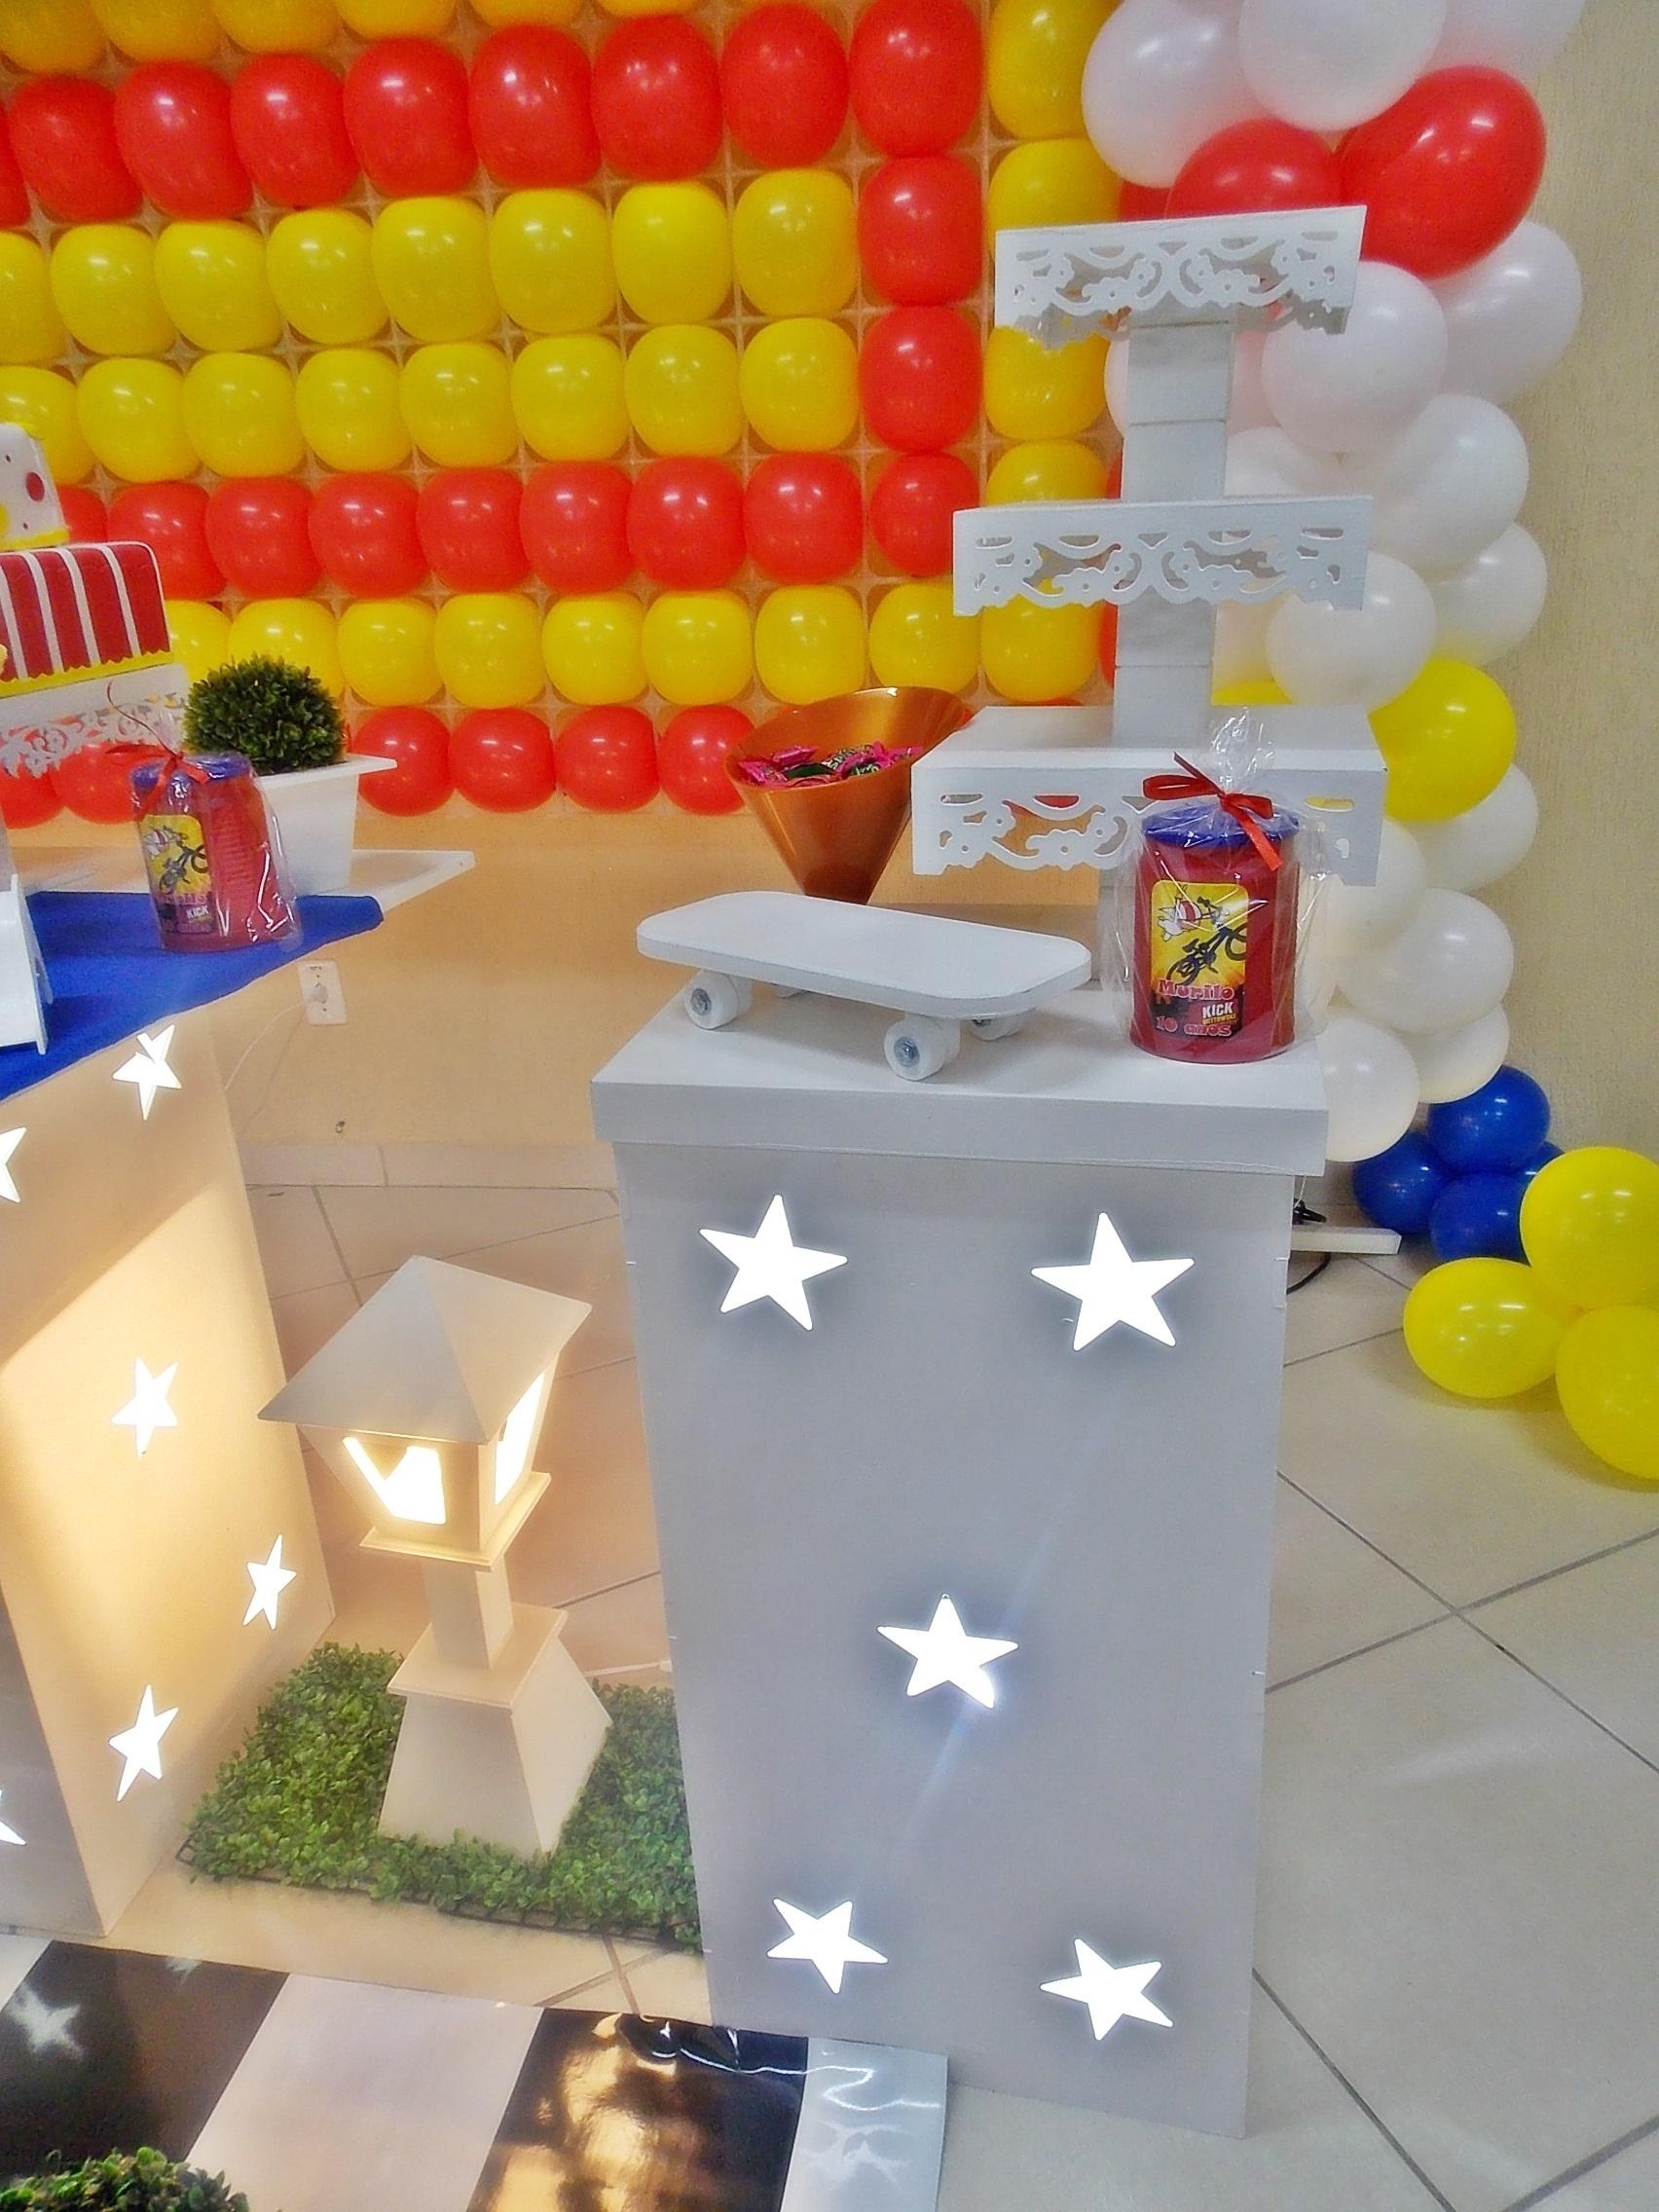 decoracao festa infantil kick buttowski : decoracao festa infantil kick buttowski:decoracao-infantil-kick-buttowski-decoracao-de-festa-infantil